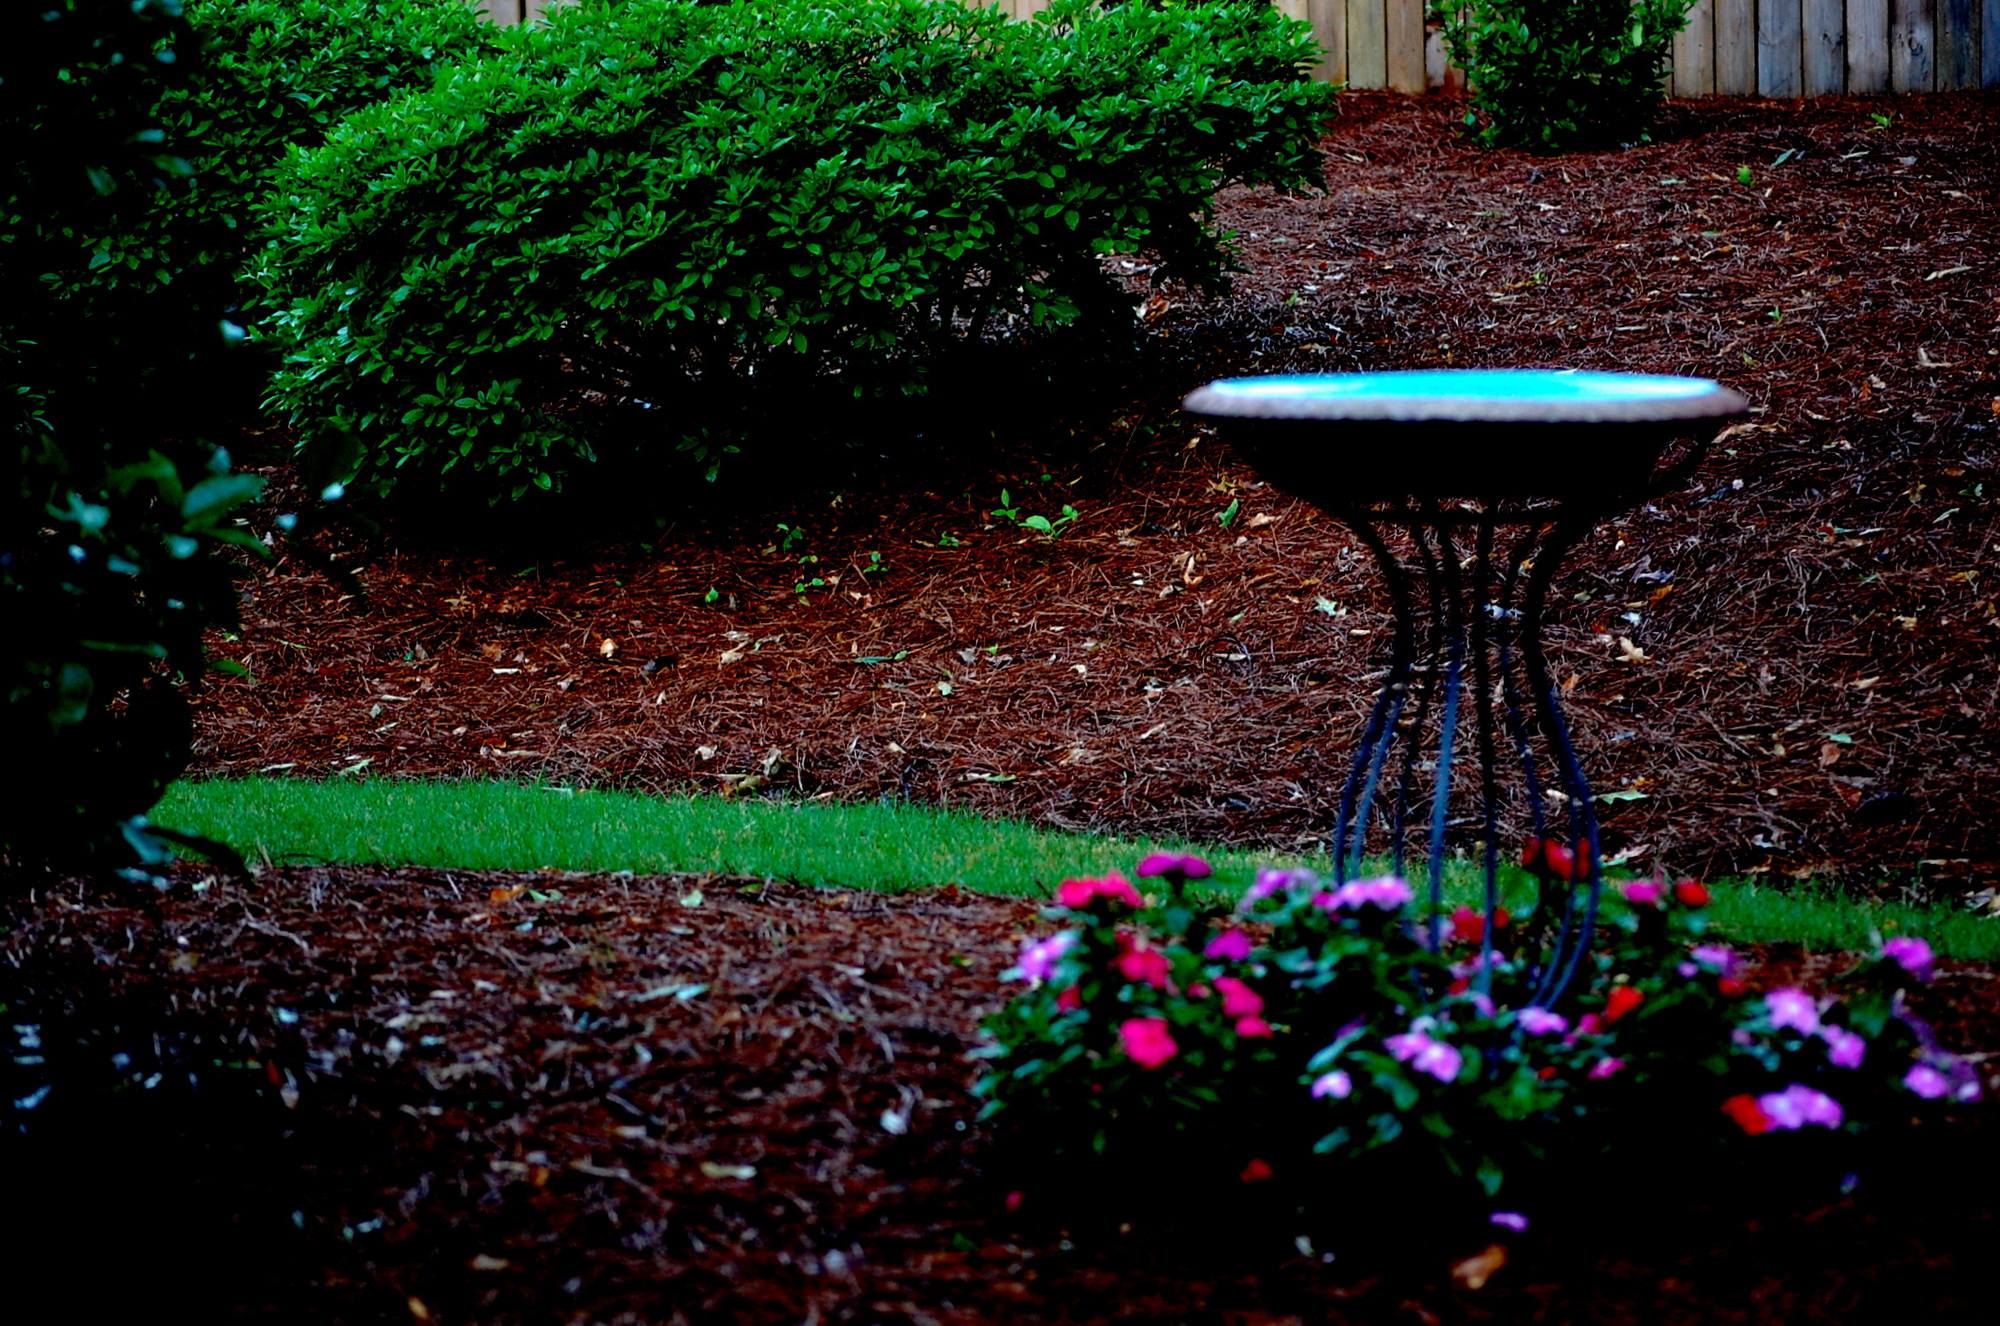 Faking It cover.Rainy garden